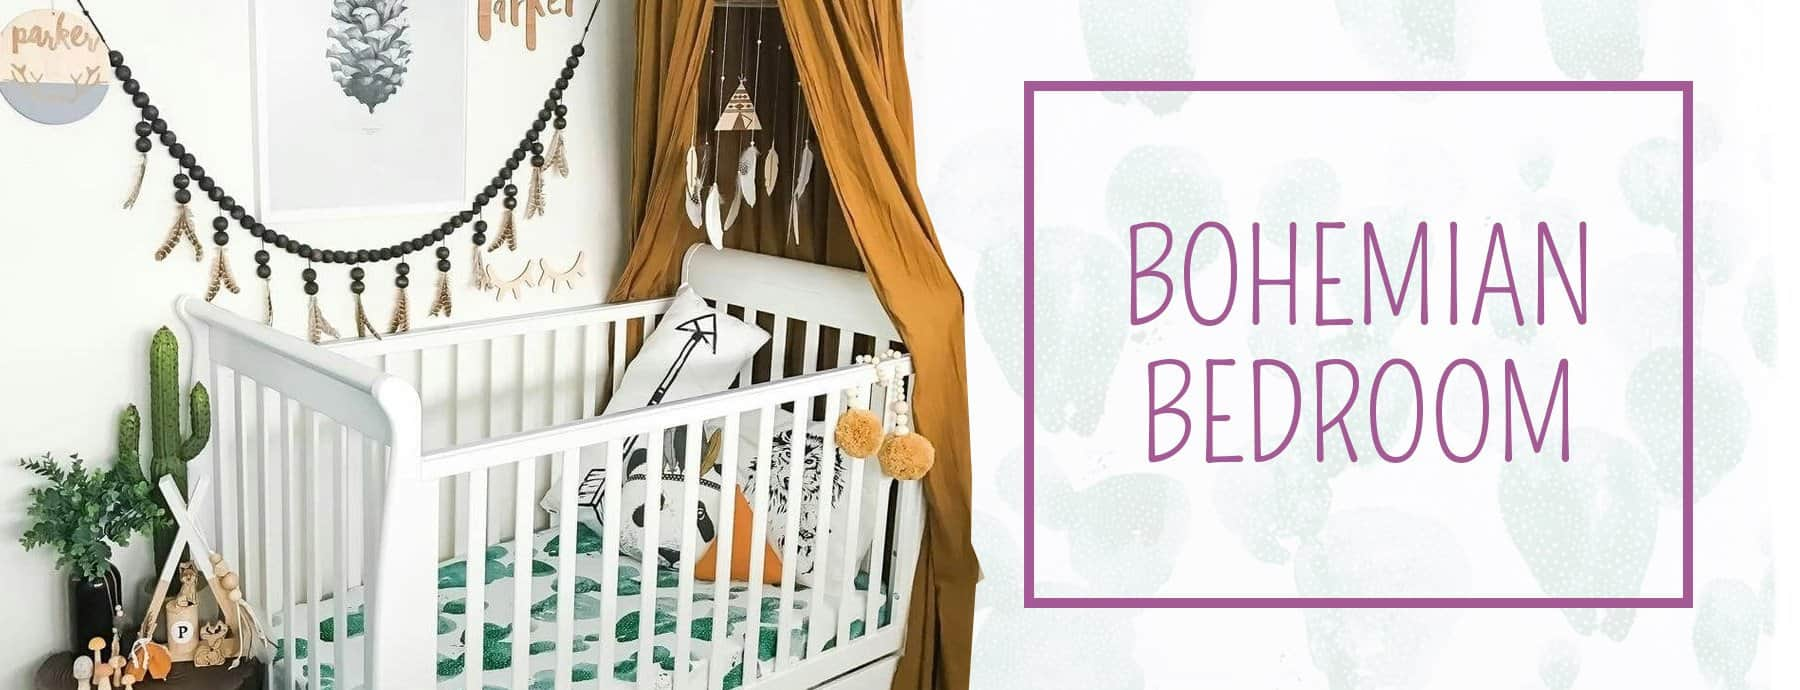 Boho Room Decor The 9 Must Have Decor Elements For Your Kid S Room Nursery Kid S Room Decor Ideas My Sleepy Monkey